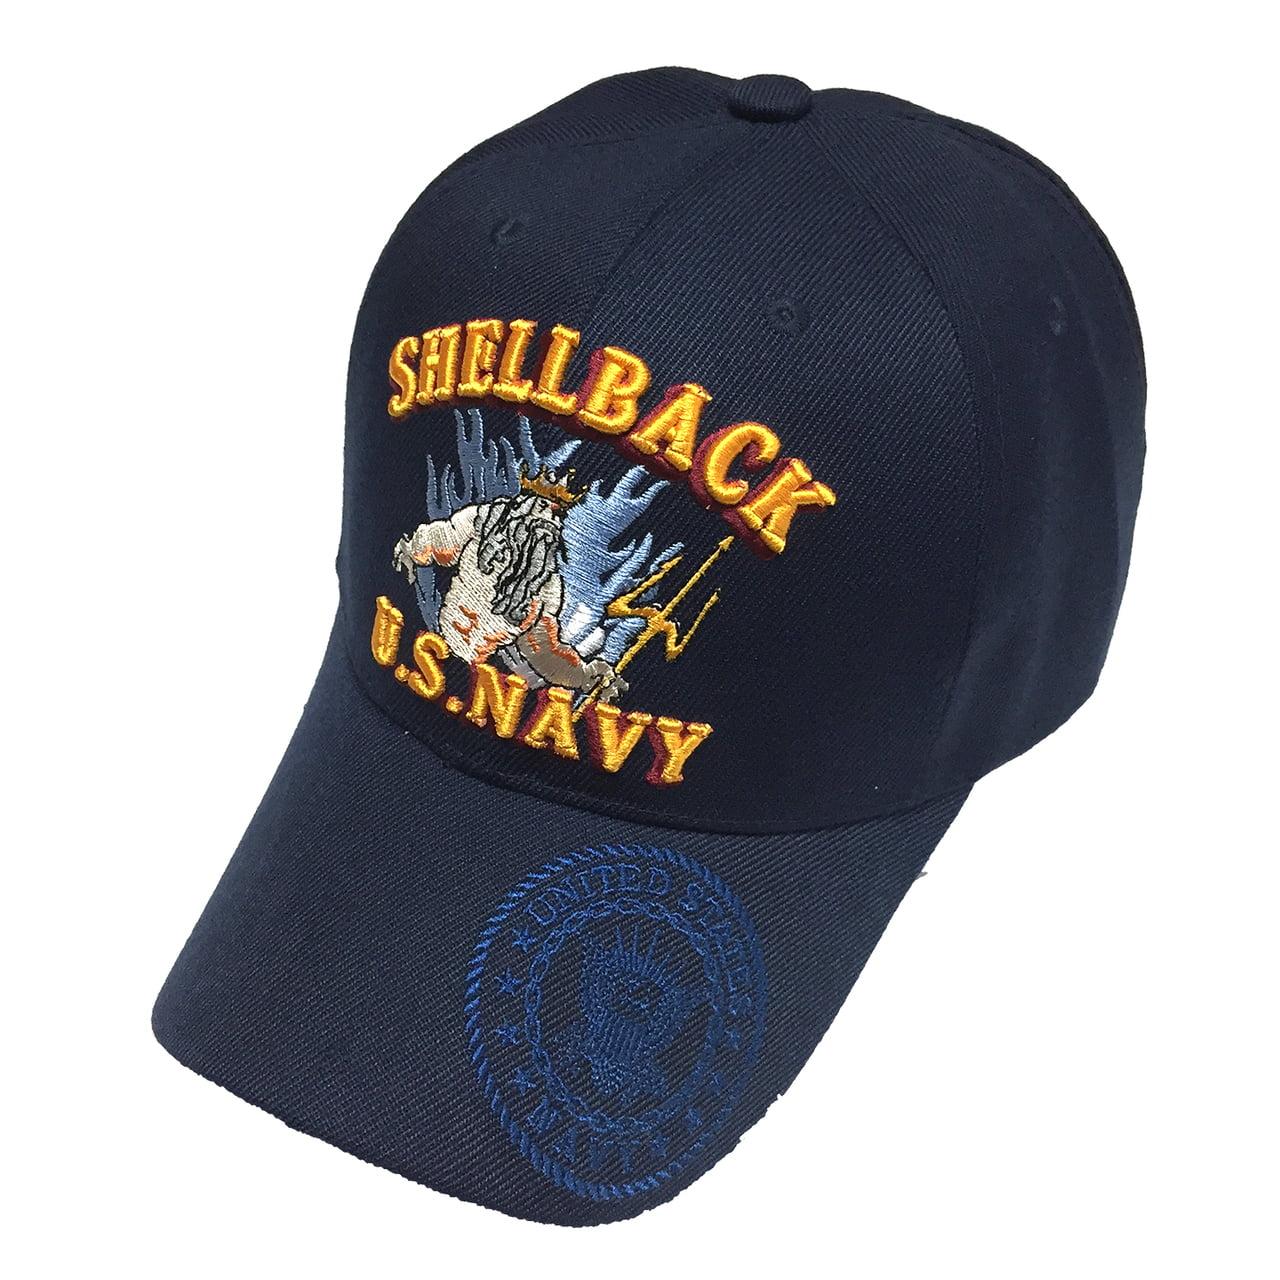 4fc78ae68d5 U.S. WARRIORS - U.S. Military Hat US NAVY Shellback Navy Baseball Cap  Men  s Adjustable Velcro - Walmart.com